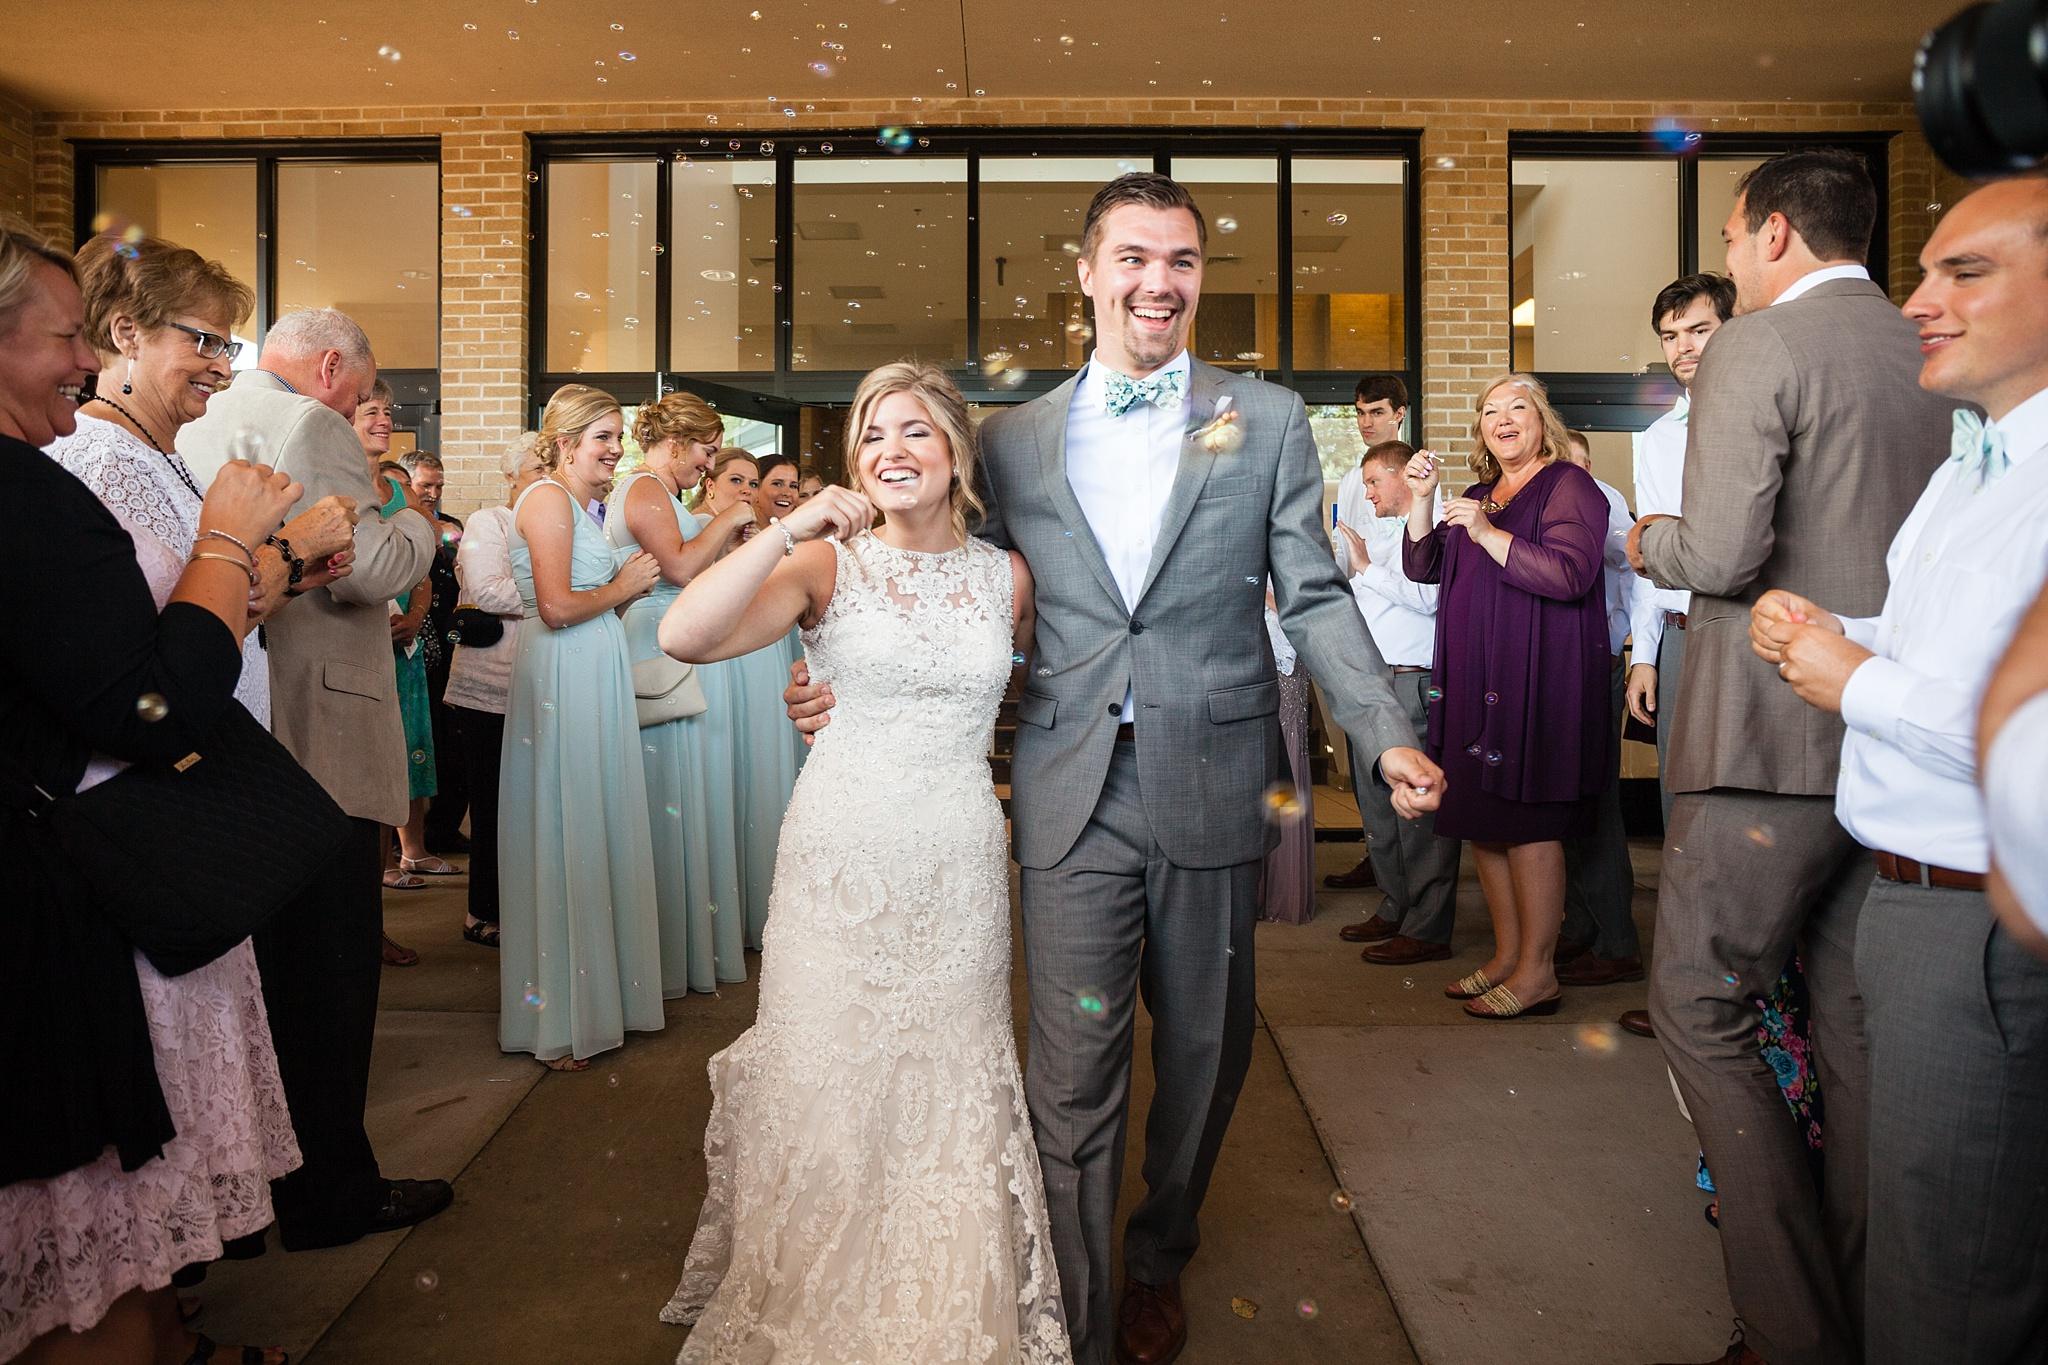 Mandi_Jack_Treehouse_Grand_Rapids_Wedding_0053.jpg